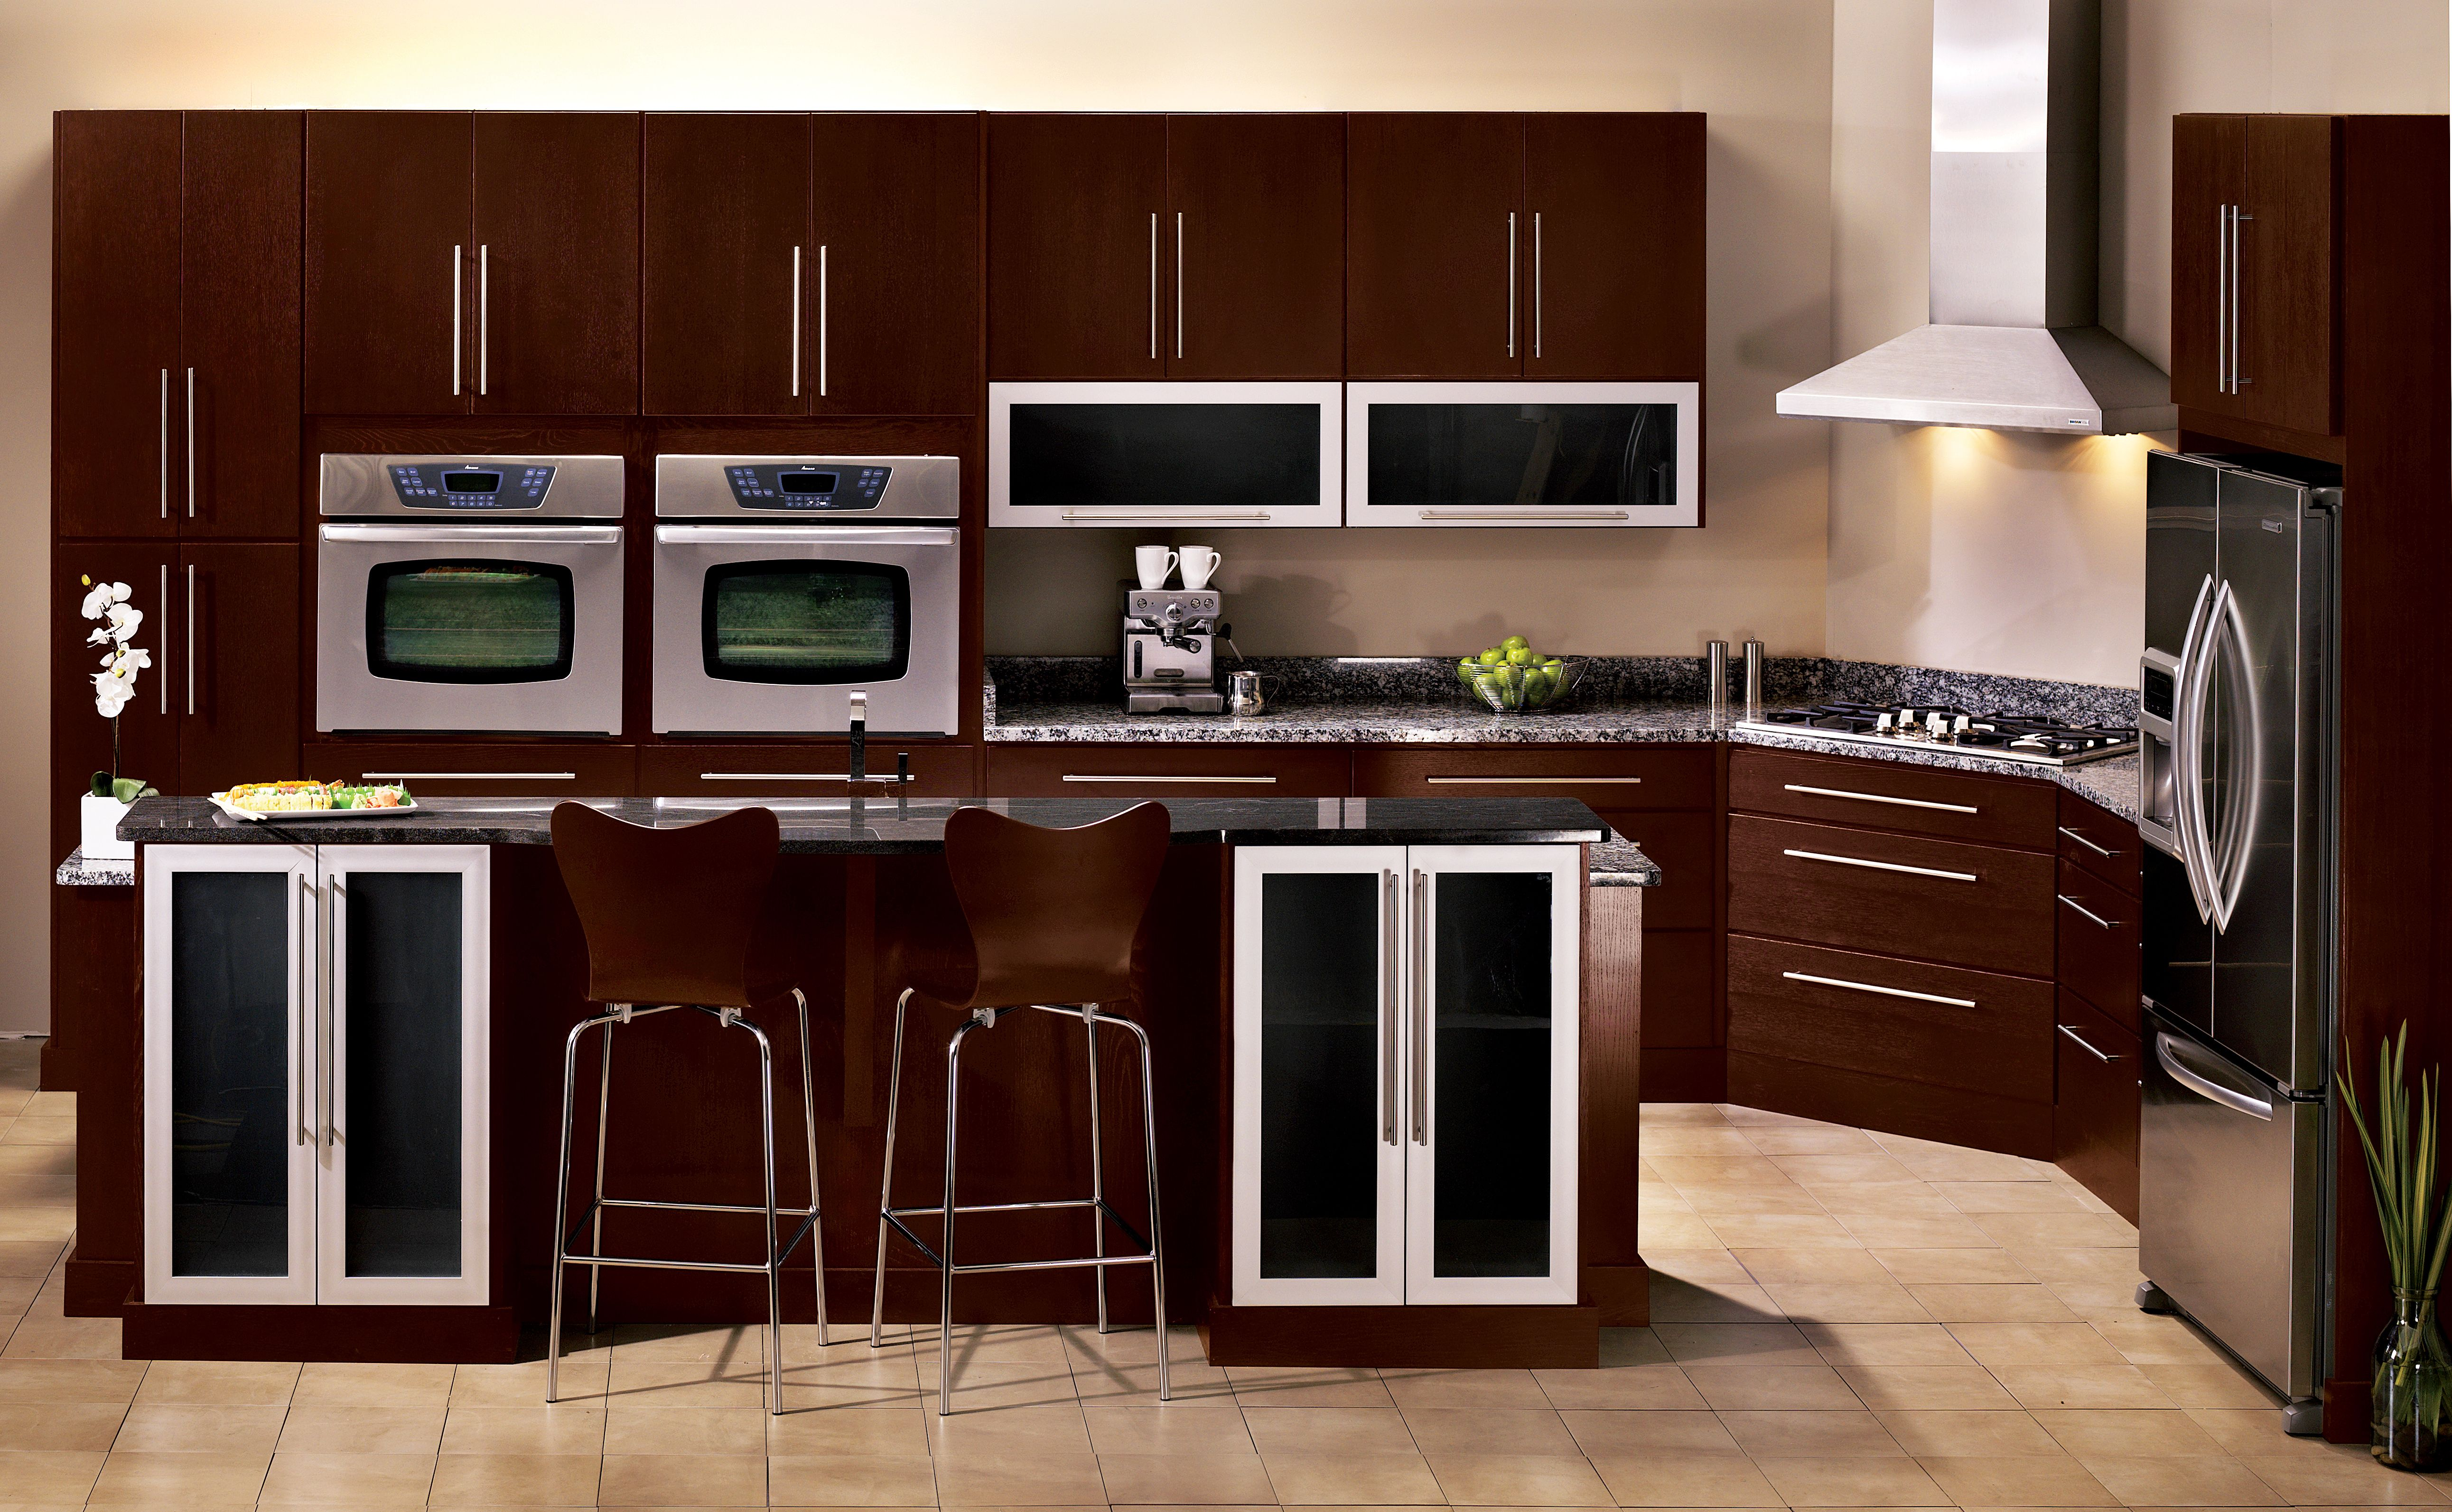 Kabinart Kitchen In Espresso Kitchen Acrylic Cabinets Cabinet Doors